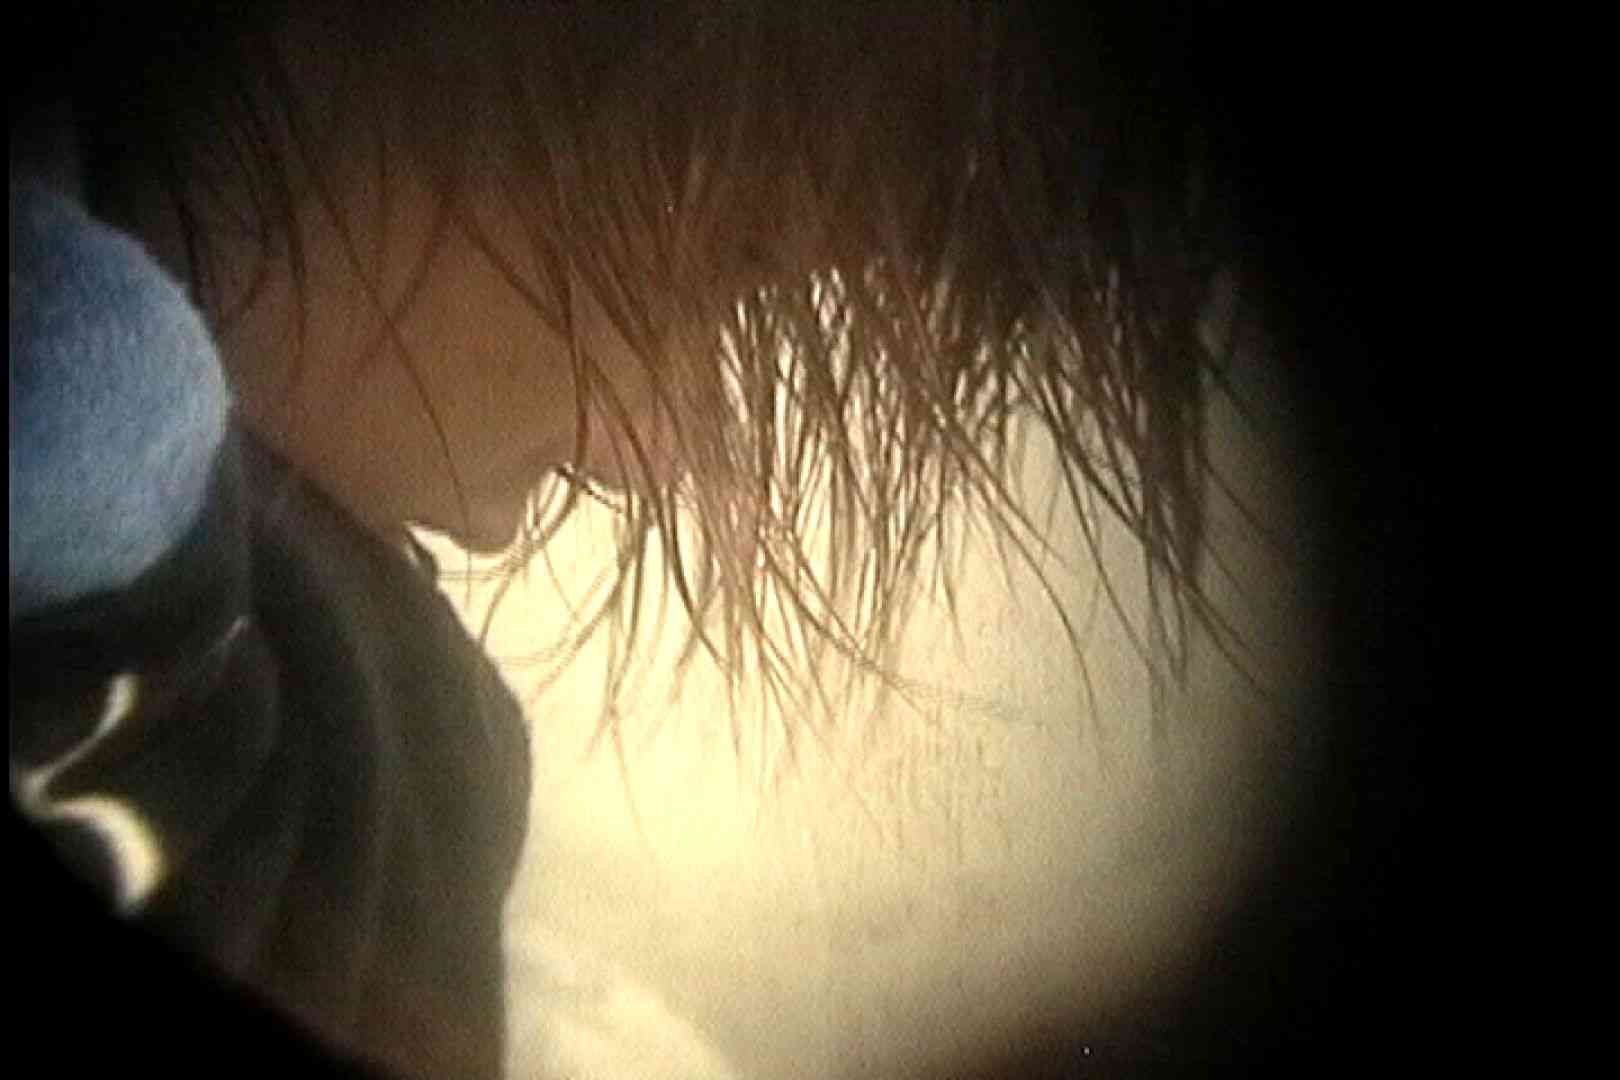 No.88 張りのある見事な巨乳のゆれ具合を堪能 巨乳 濡れ場動画紹介 95枚 21